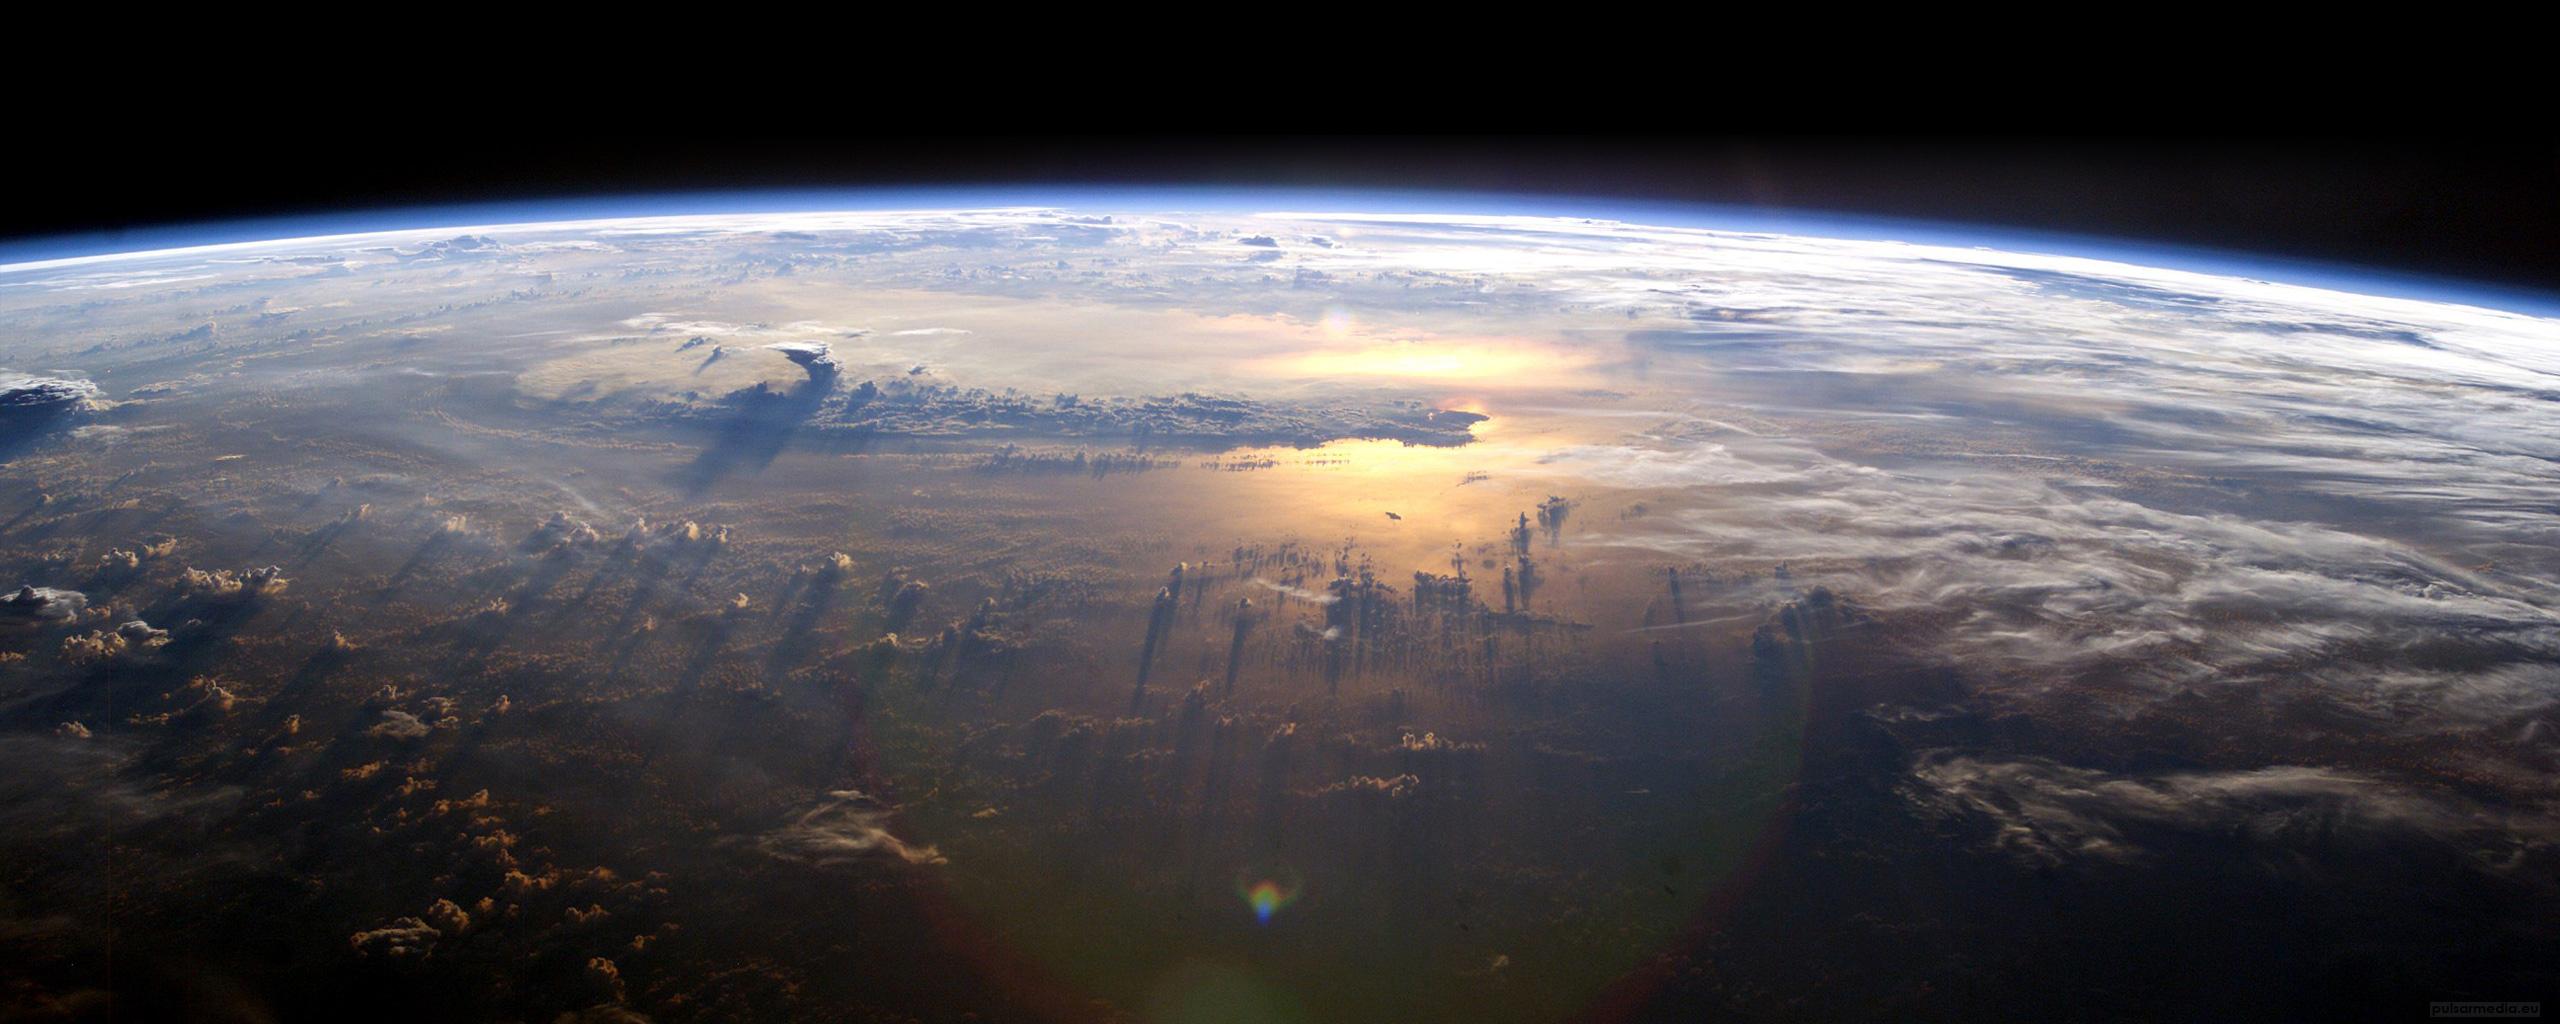 Dual Screen Wallpaper   Earth From Space 2560x1024 Dual Screen 2560x1024